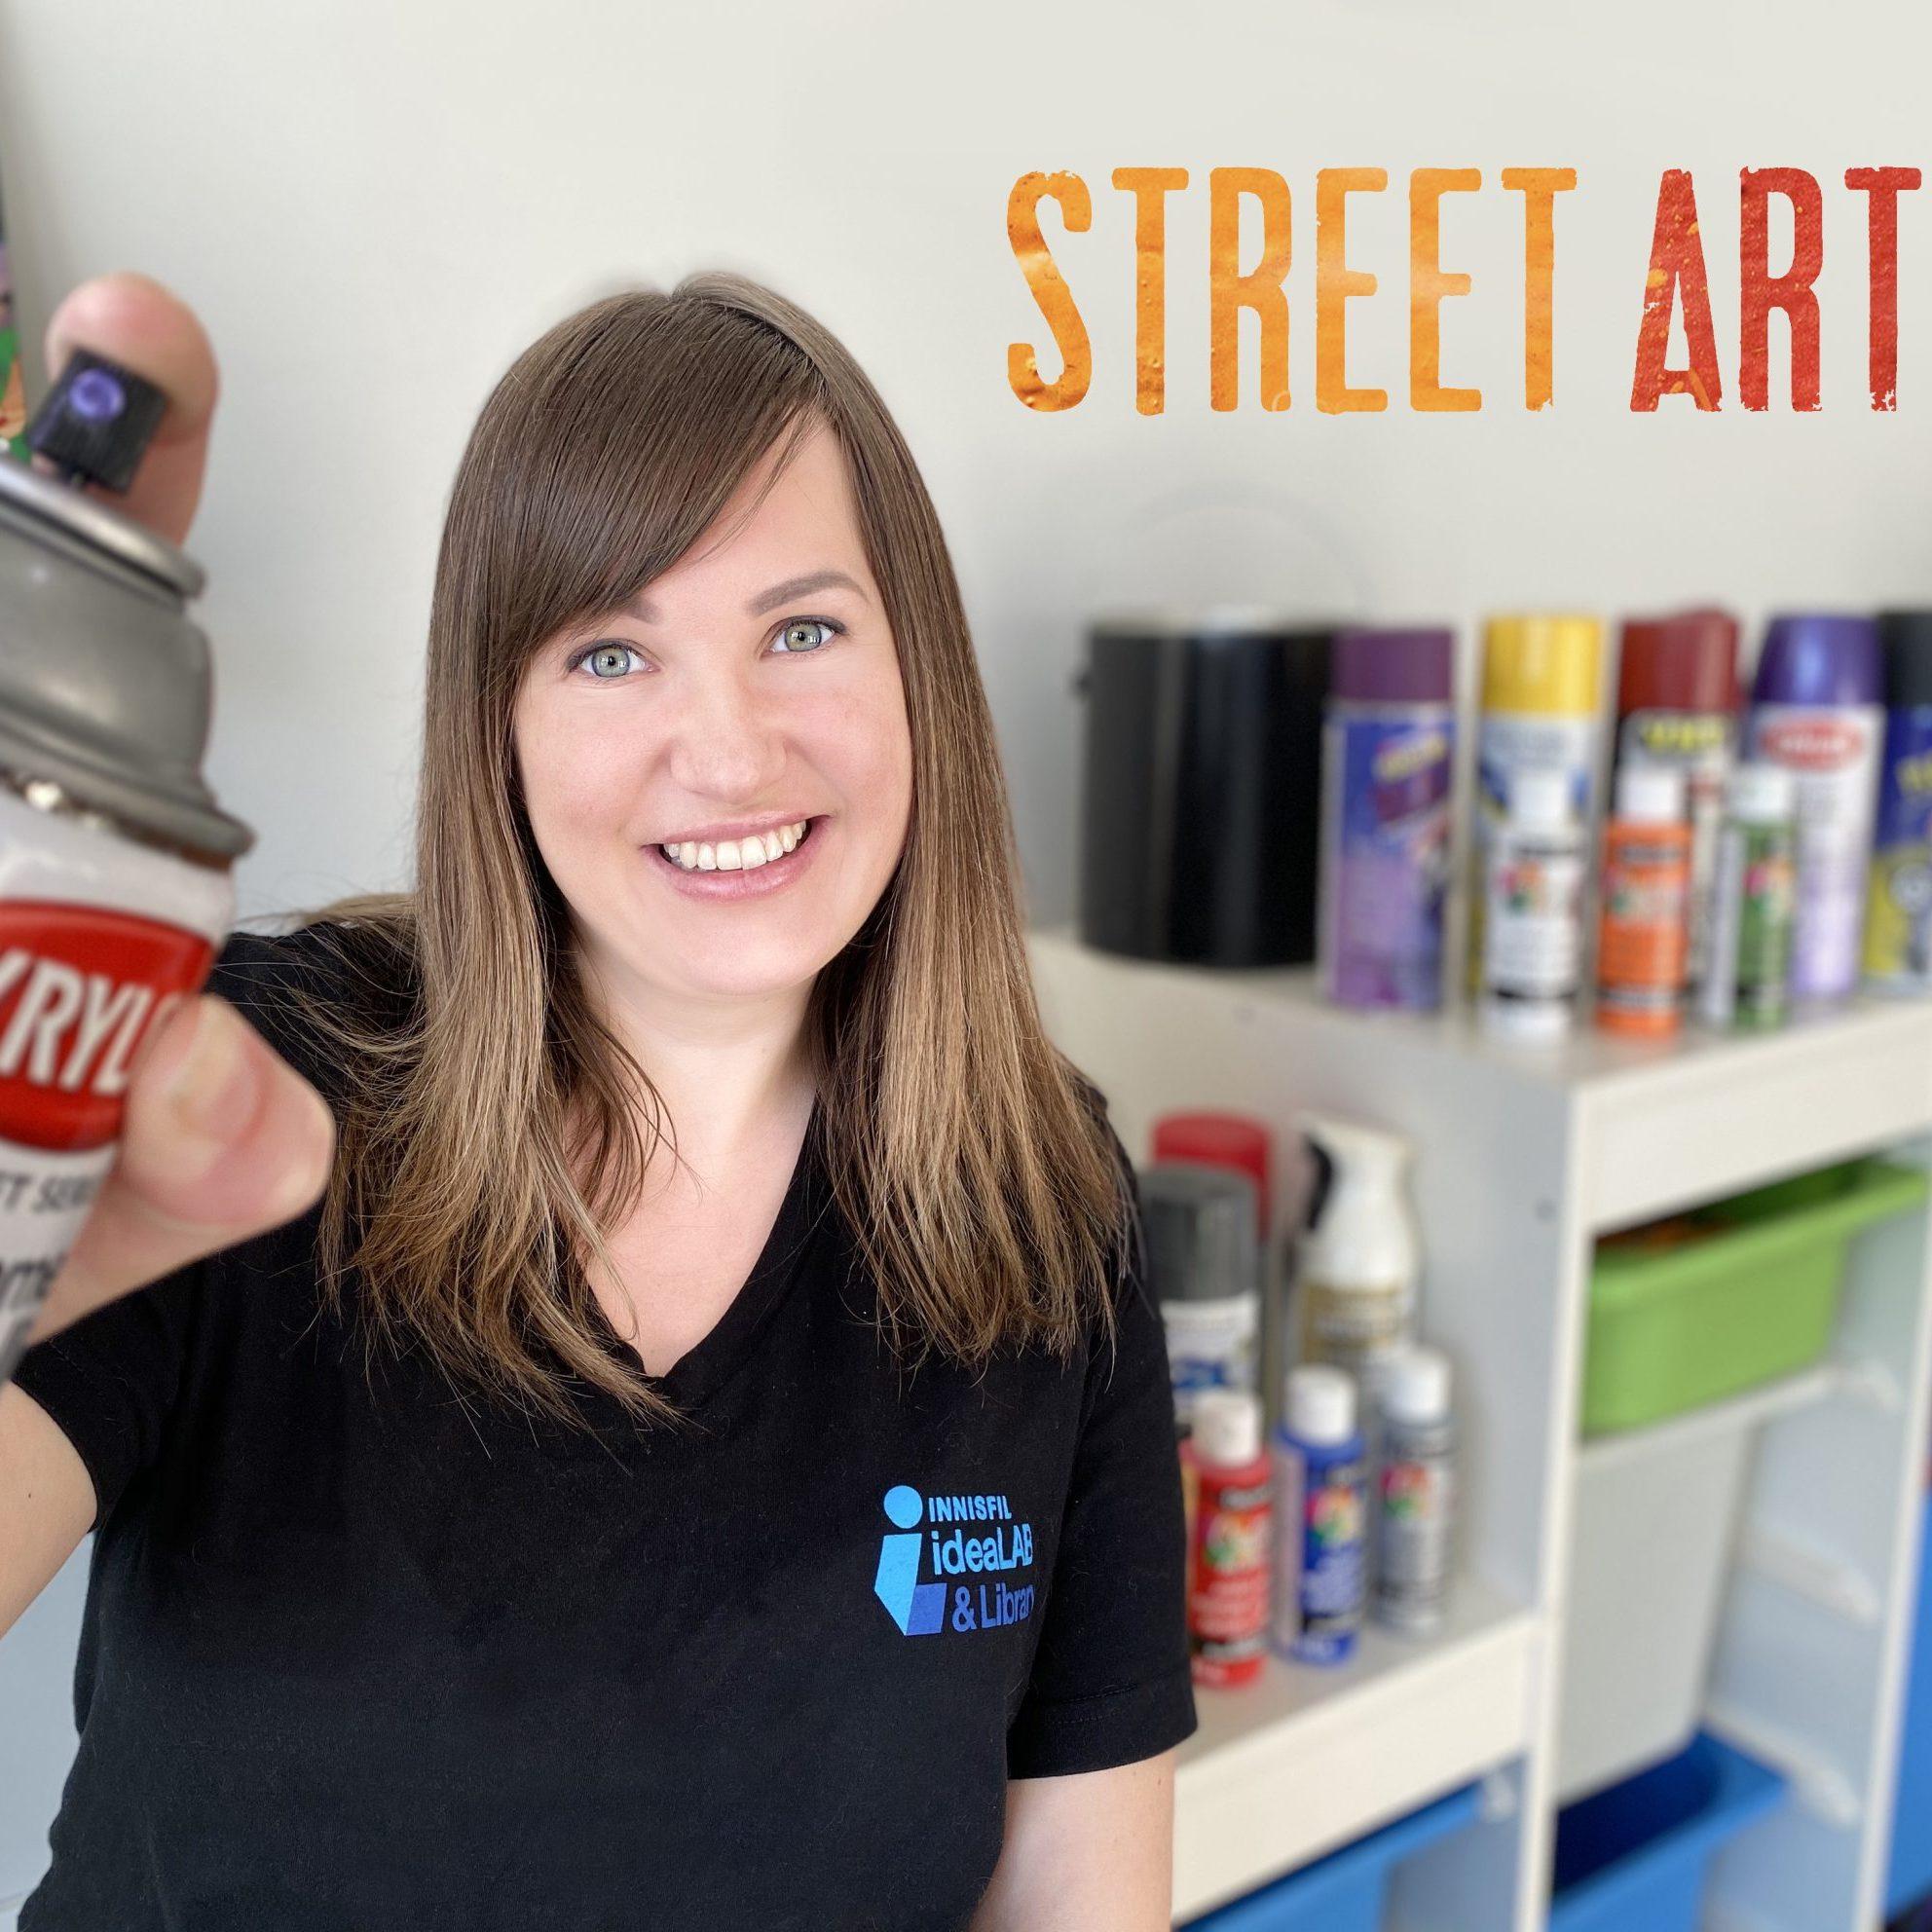 Virtual Street Art Tours